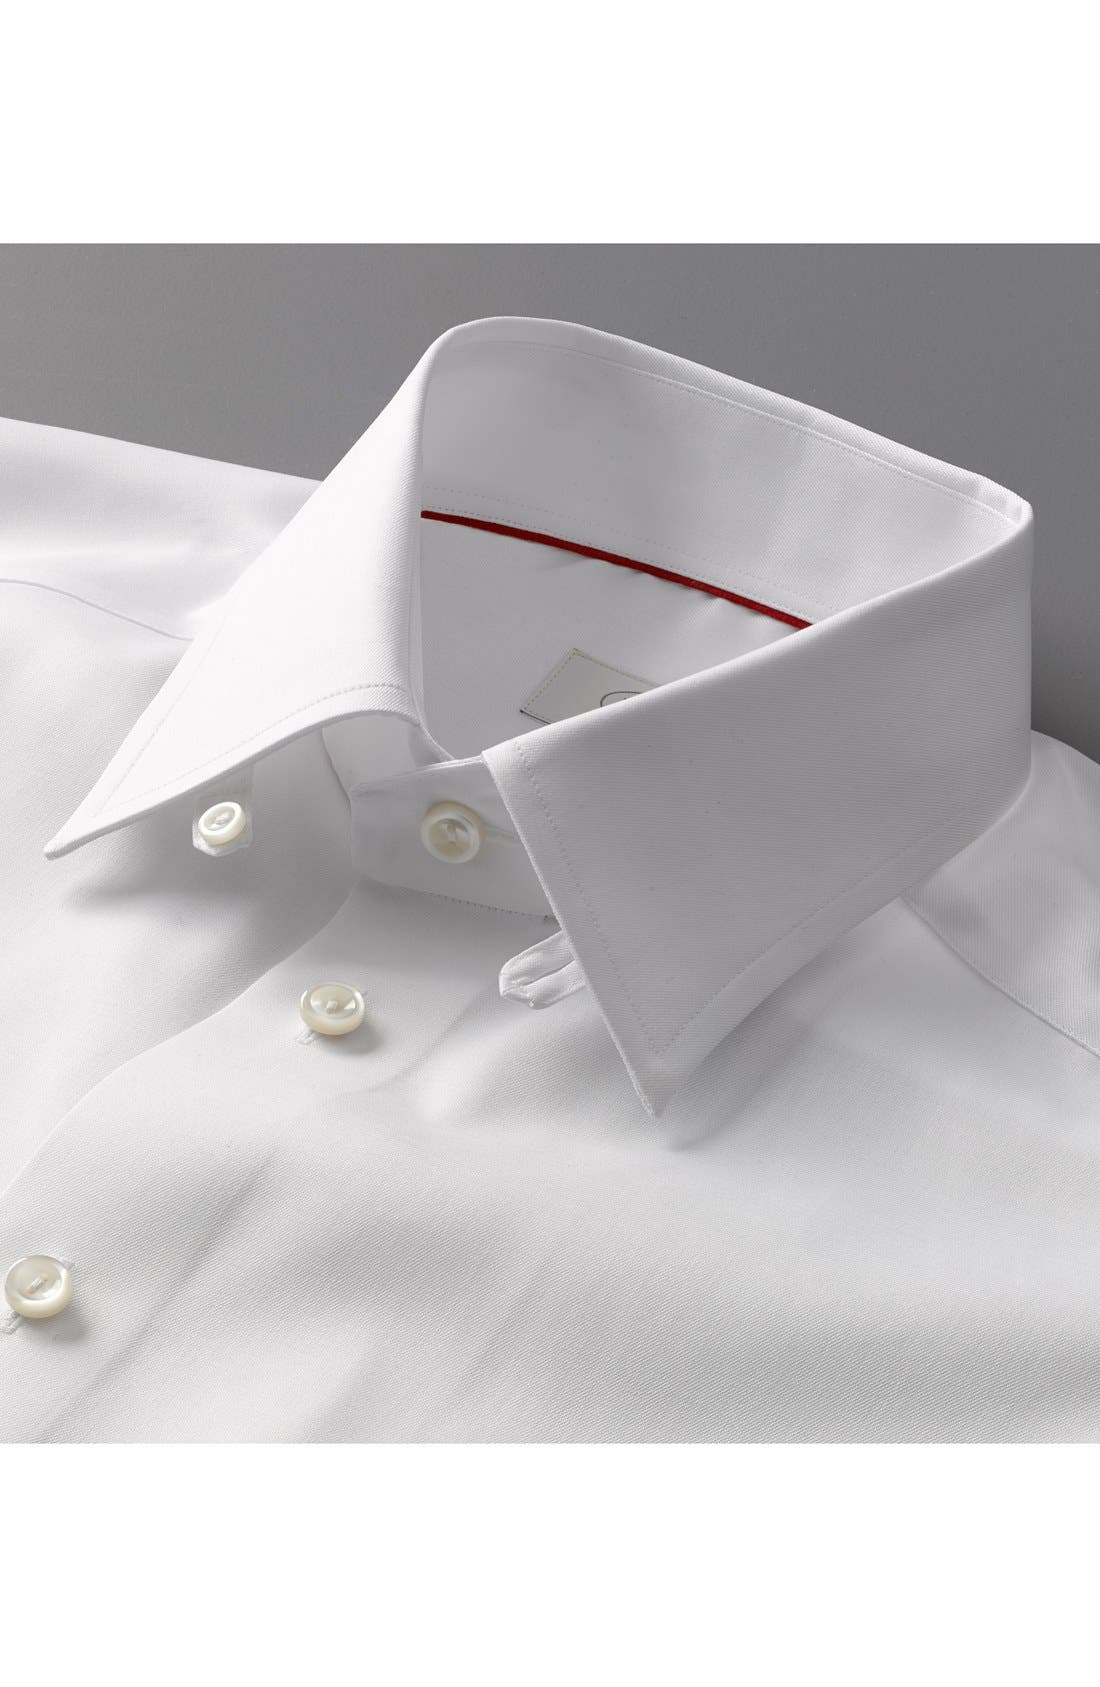 Alternate Image 3  - Eton Slim Fit Dress Shirt